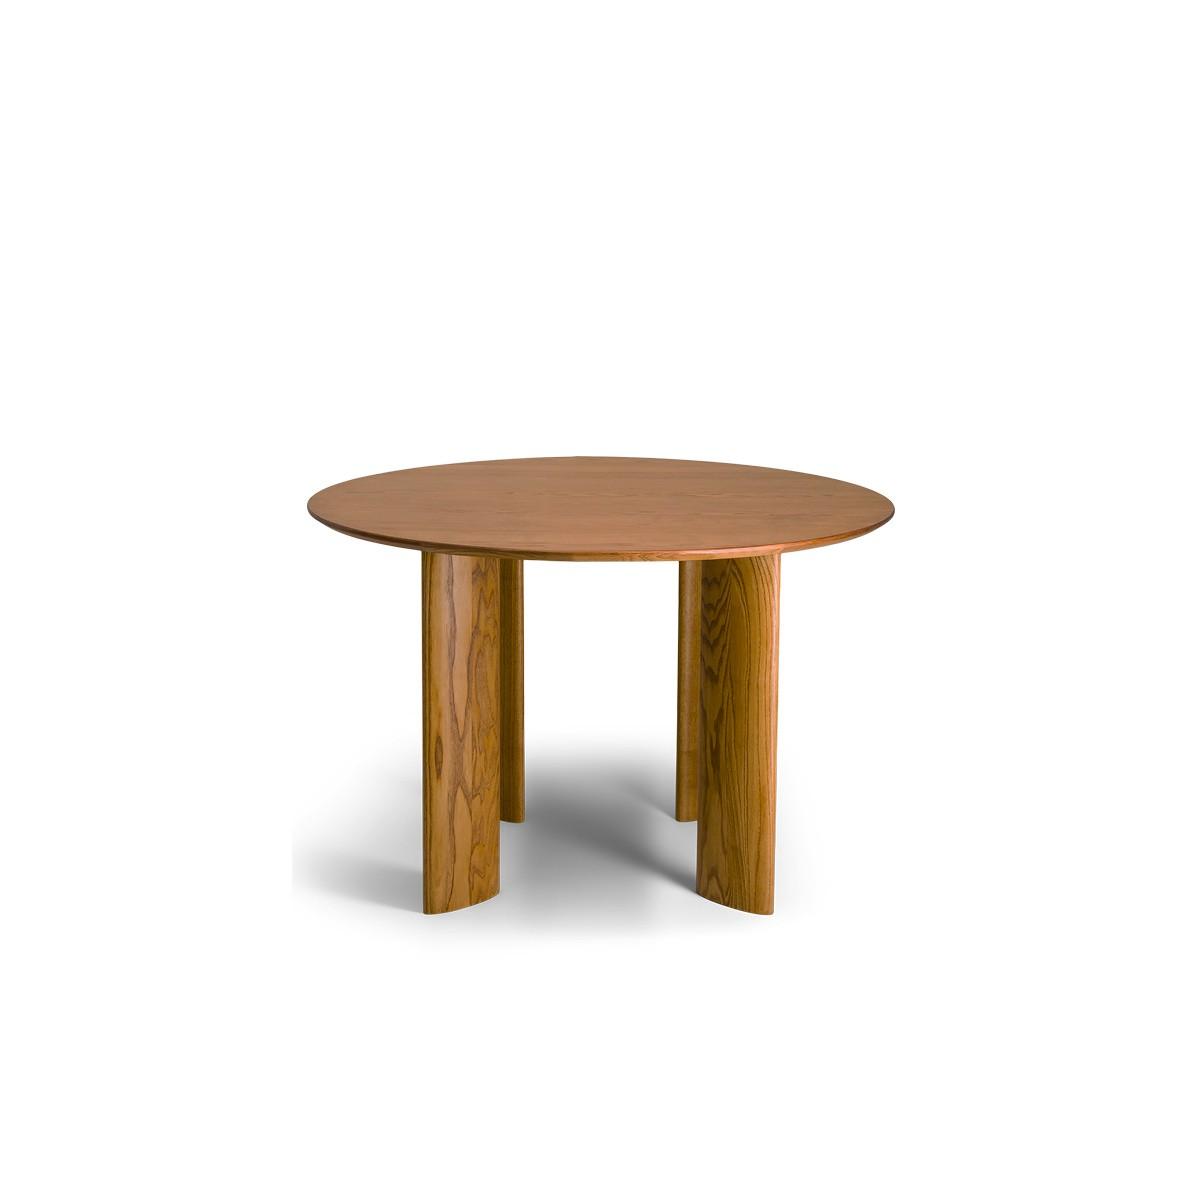 Carlotta Alta Round Wooden Table